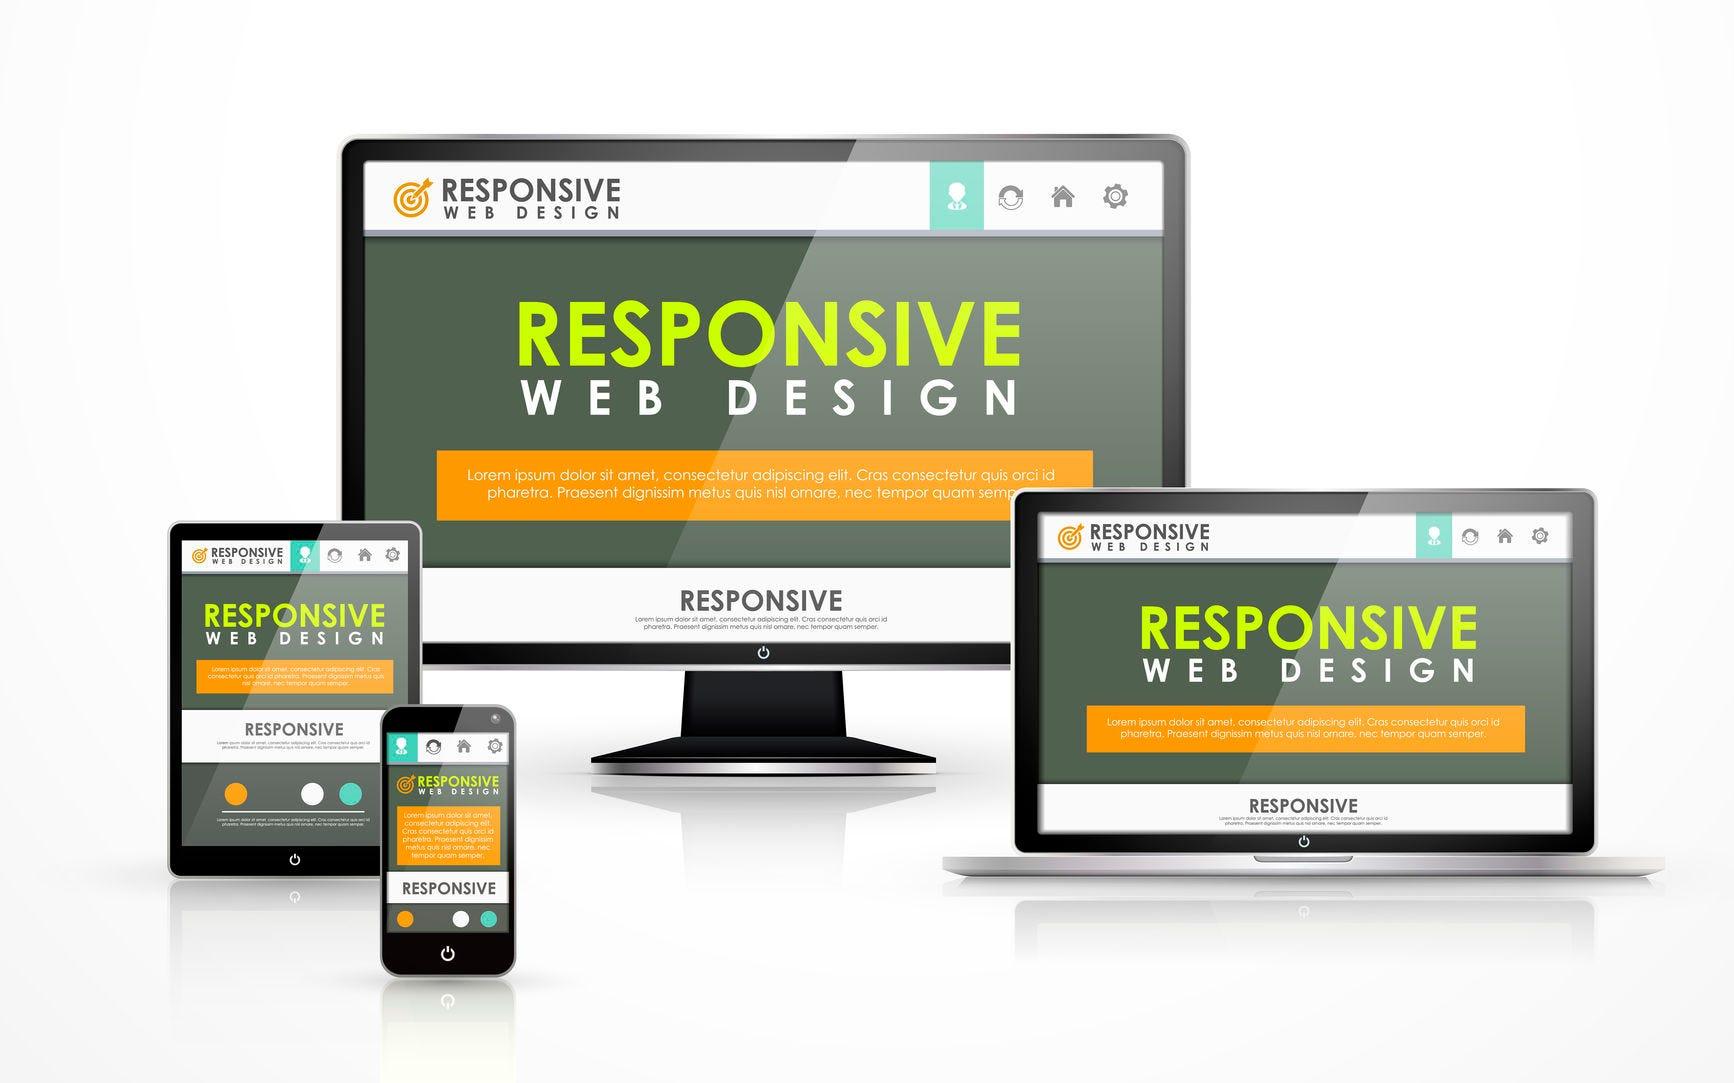 Best Practices Of Responsive Web Design Level Up Medium